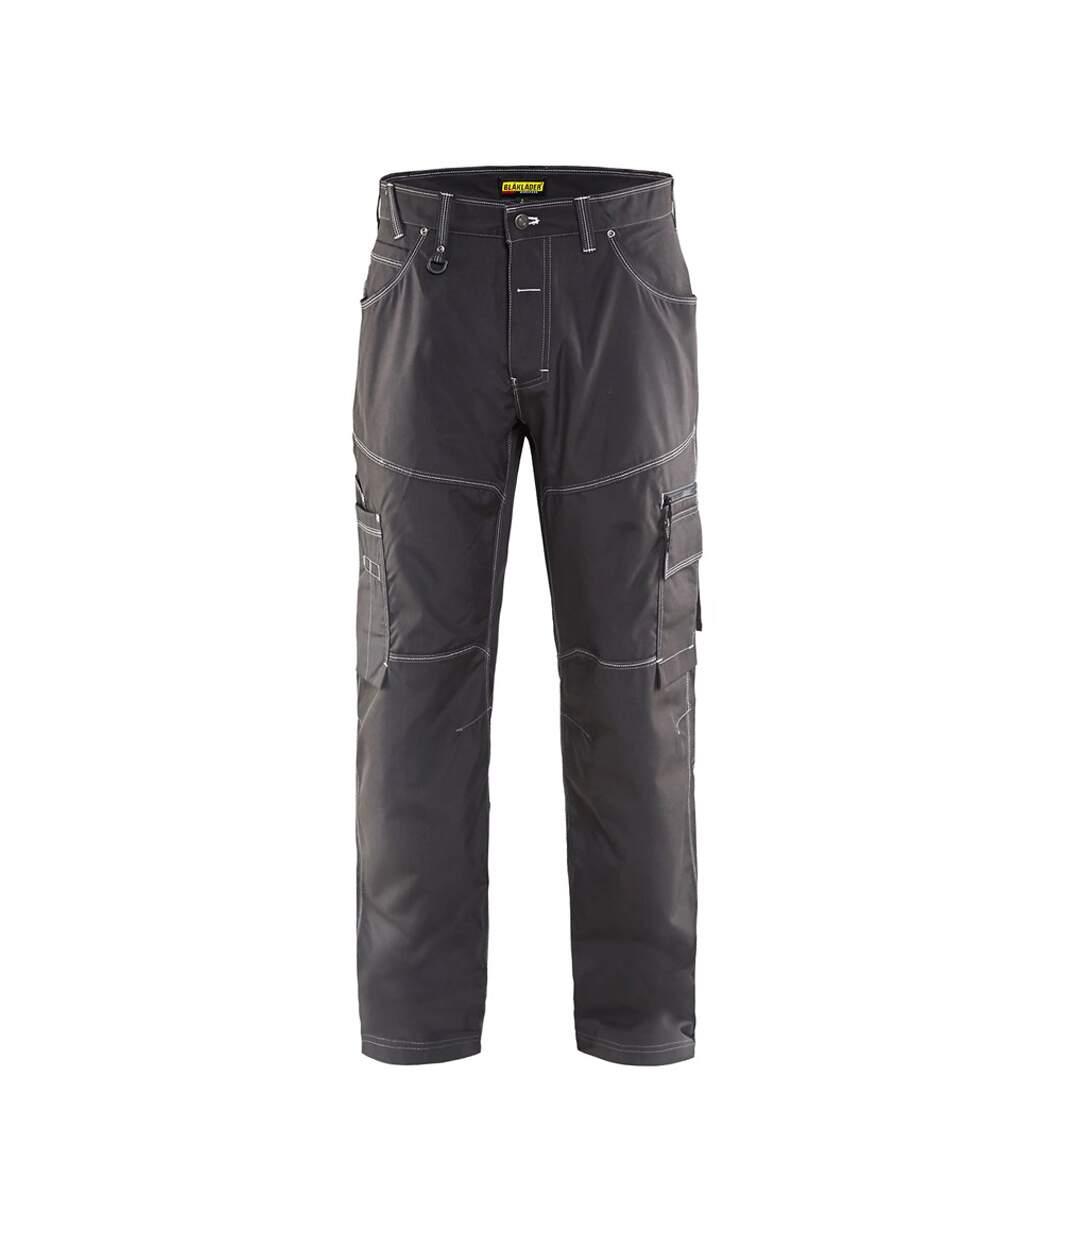 Pantalon  Blaklader X1900 urban Polycoton